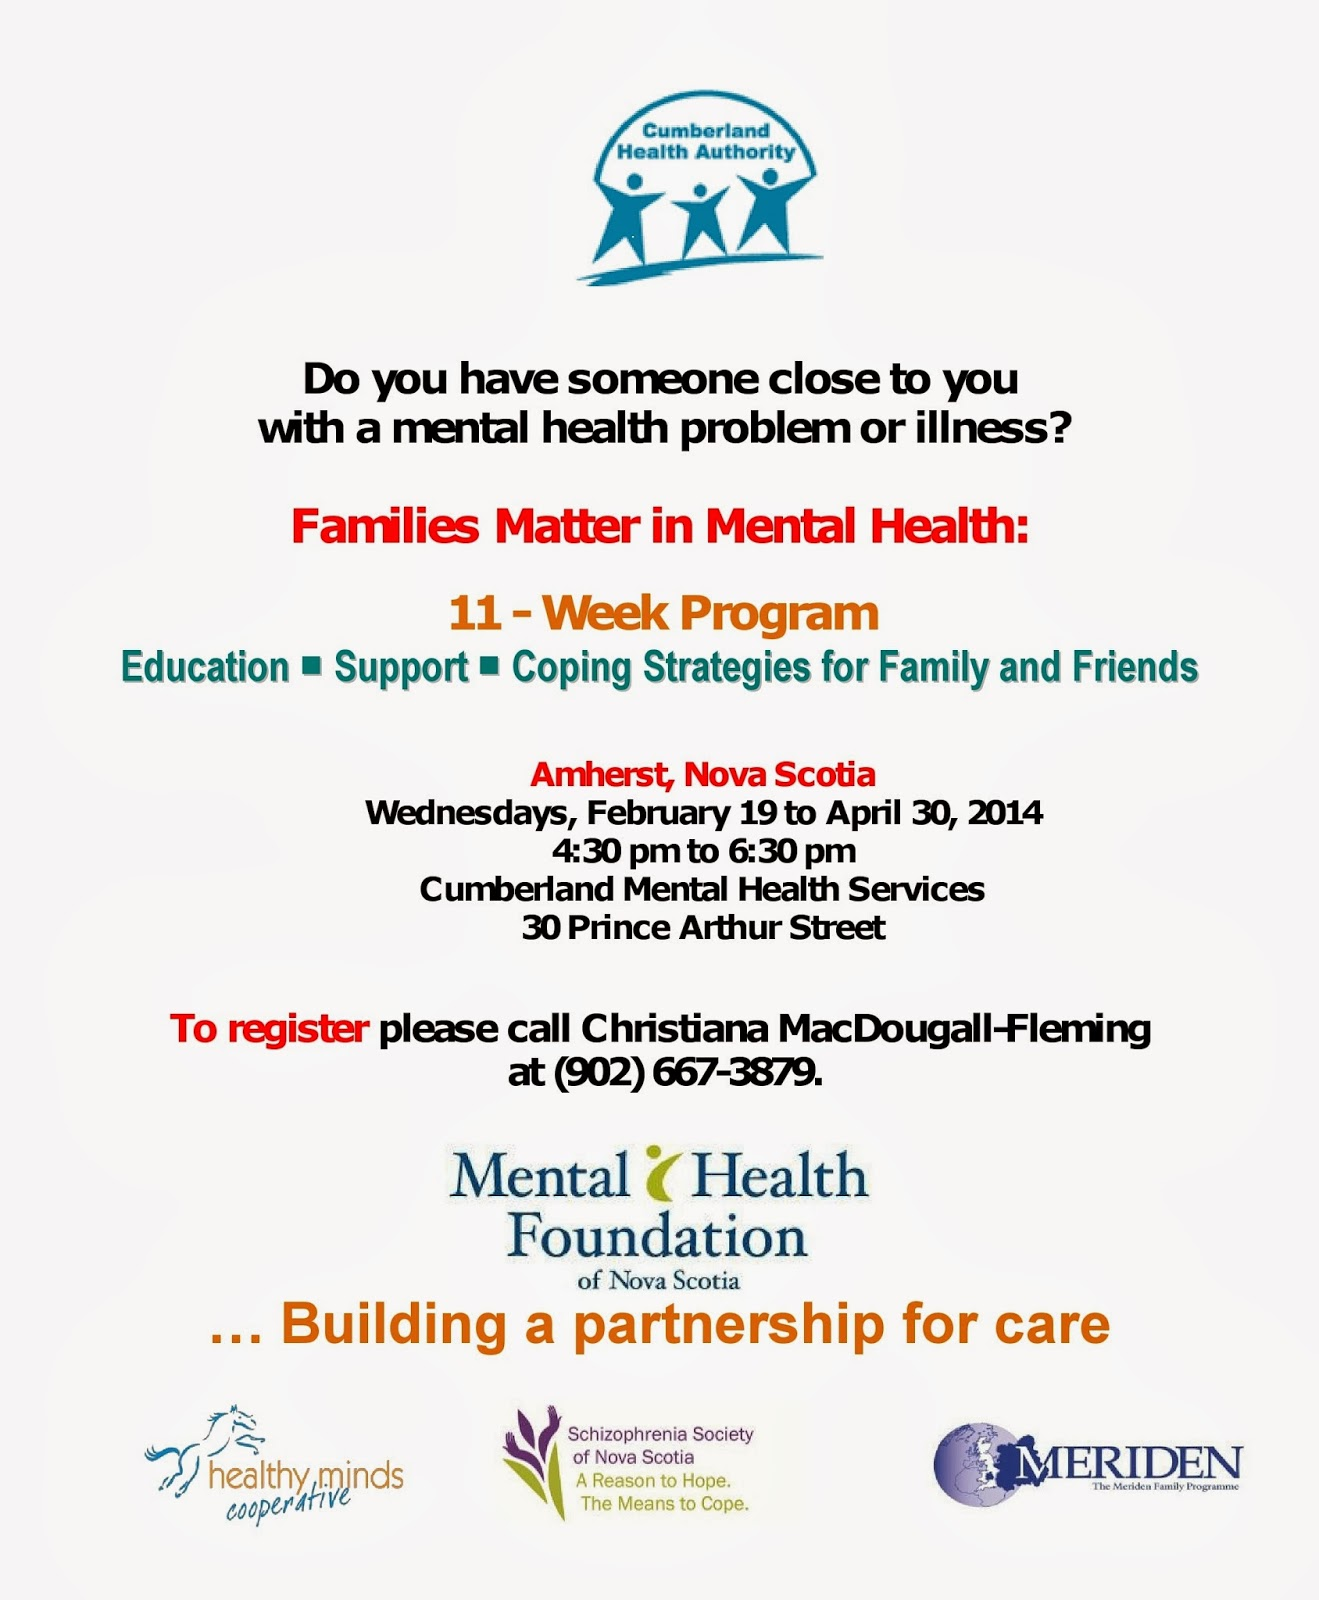 Mental Health Cumberland Mental Health